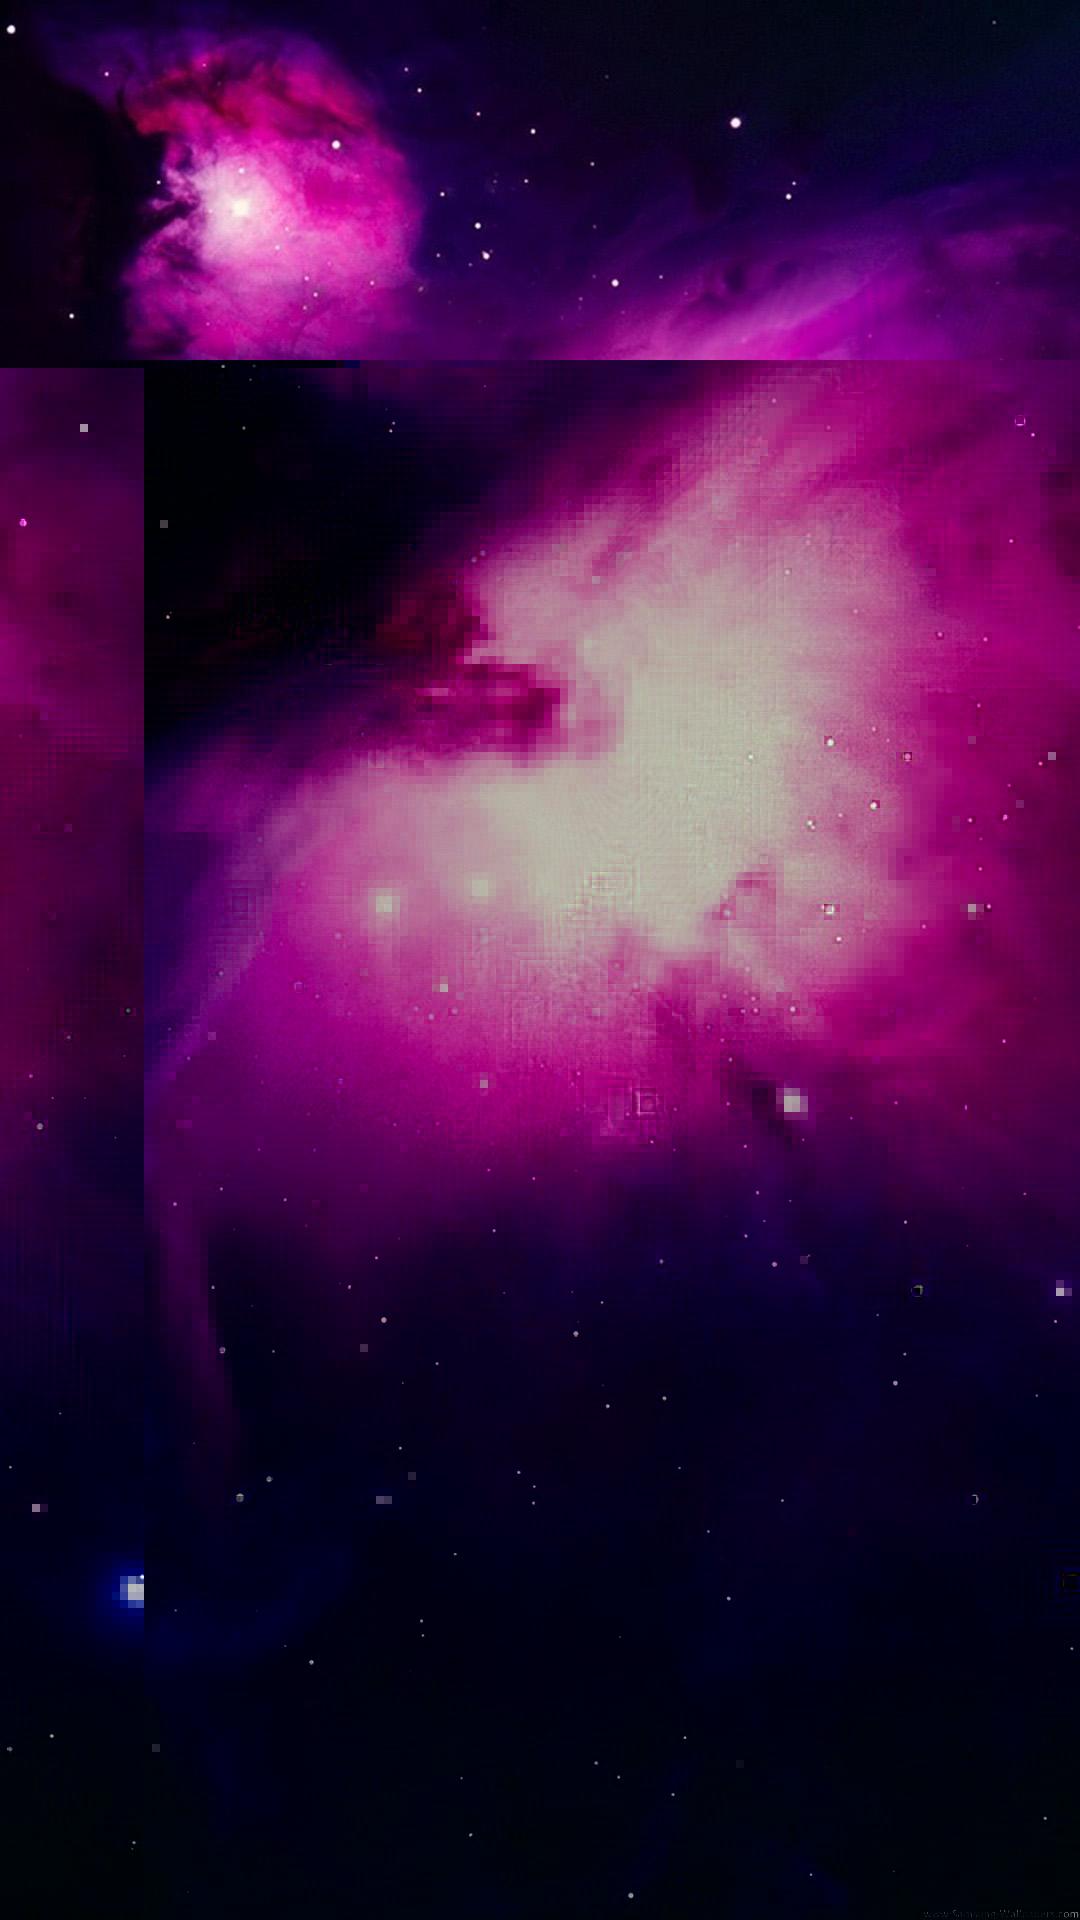 Orionnebel Hintergrundbilder Fur Handys 1080x1920 Wallpapertip